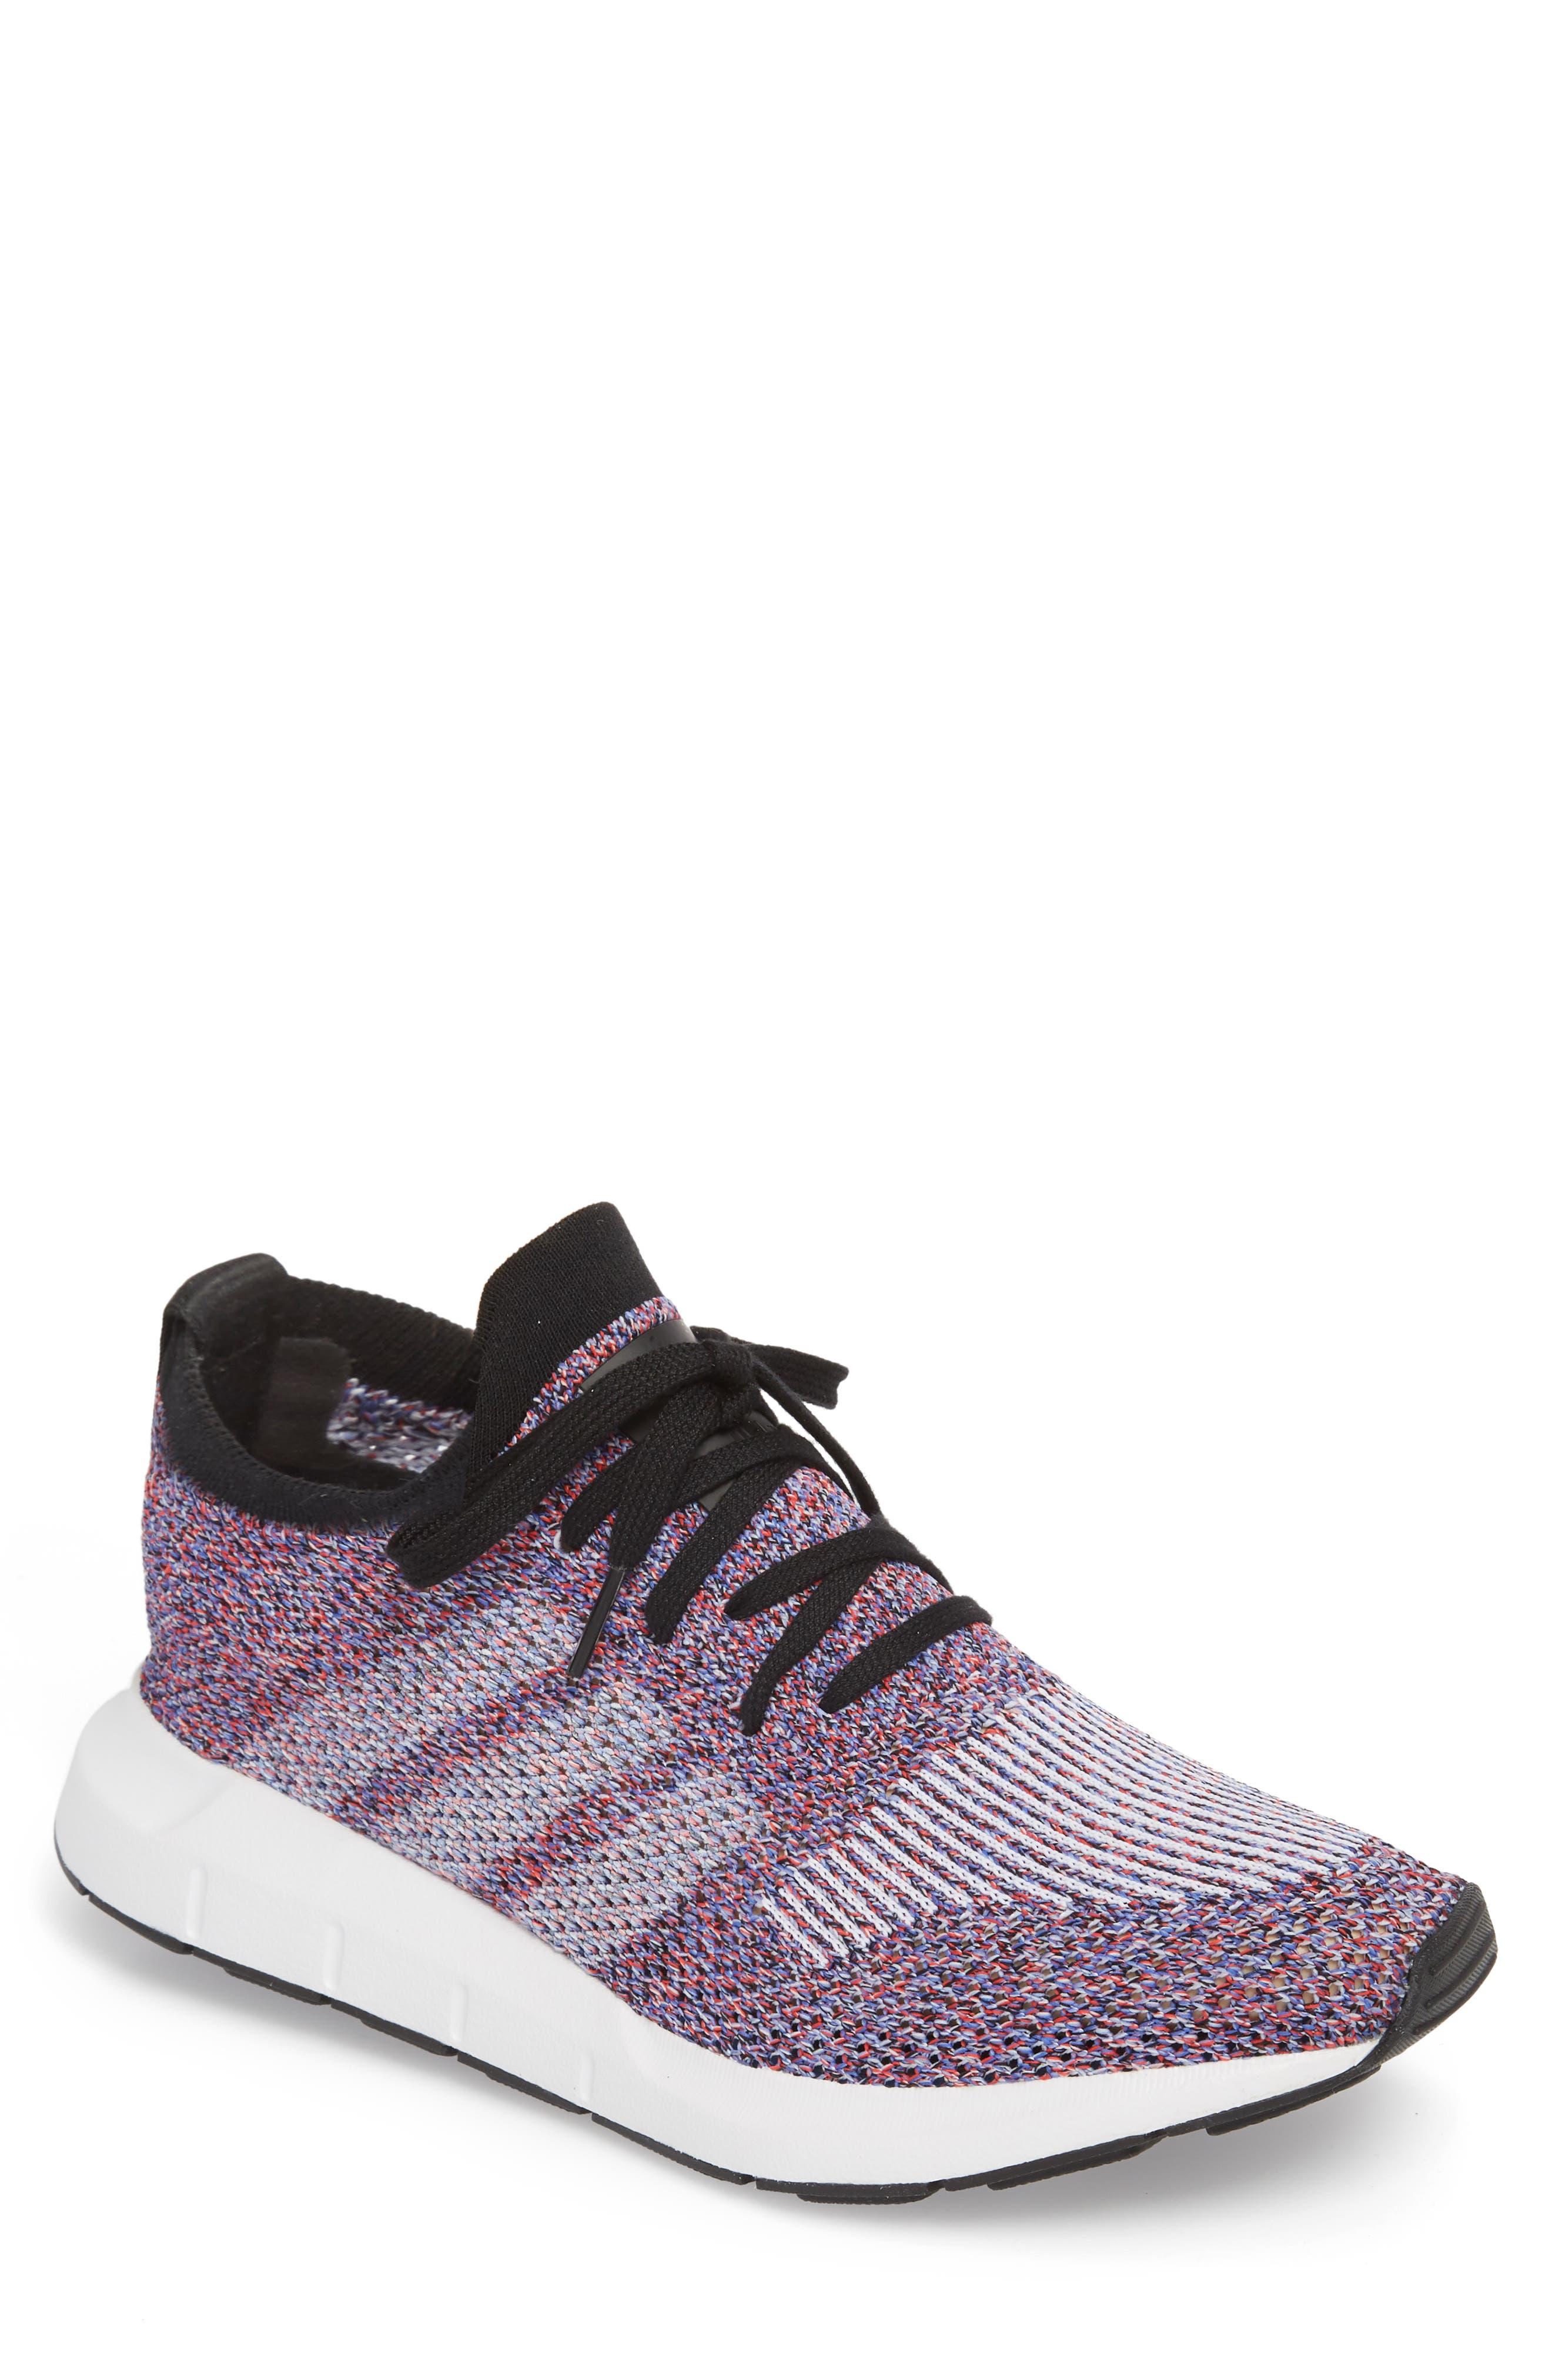 Swift Run Primeknit Sneaker,                         Main,                         color, White/ Purple/ Black